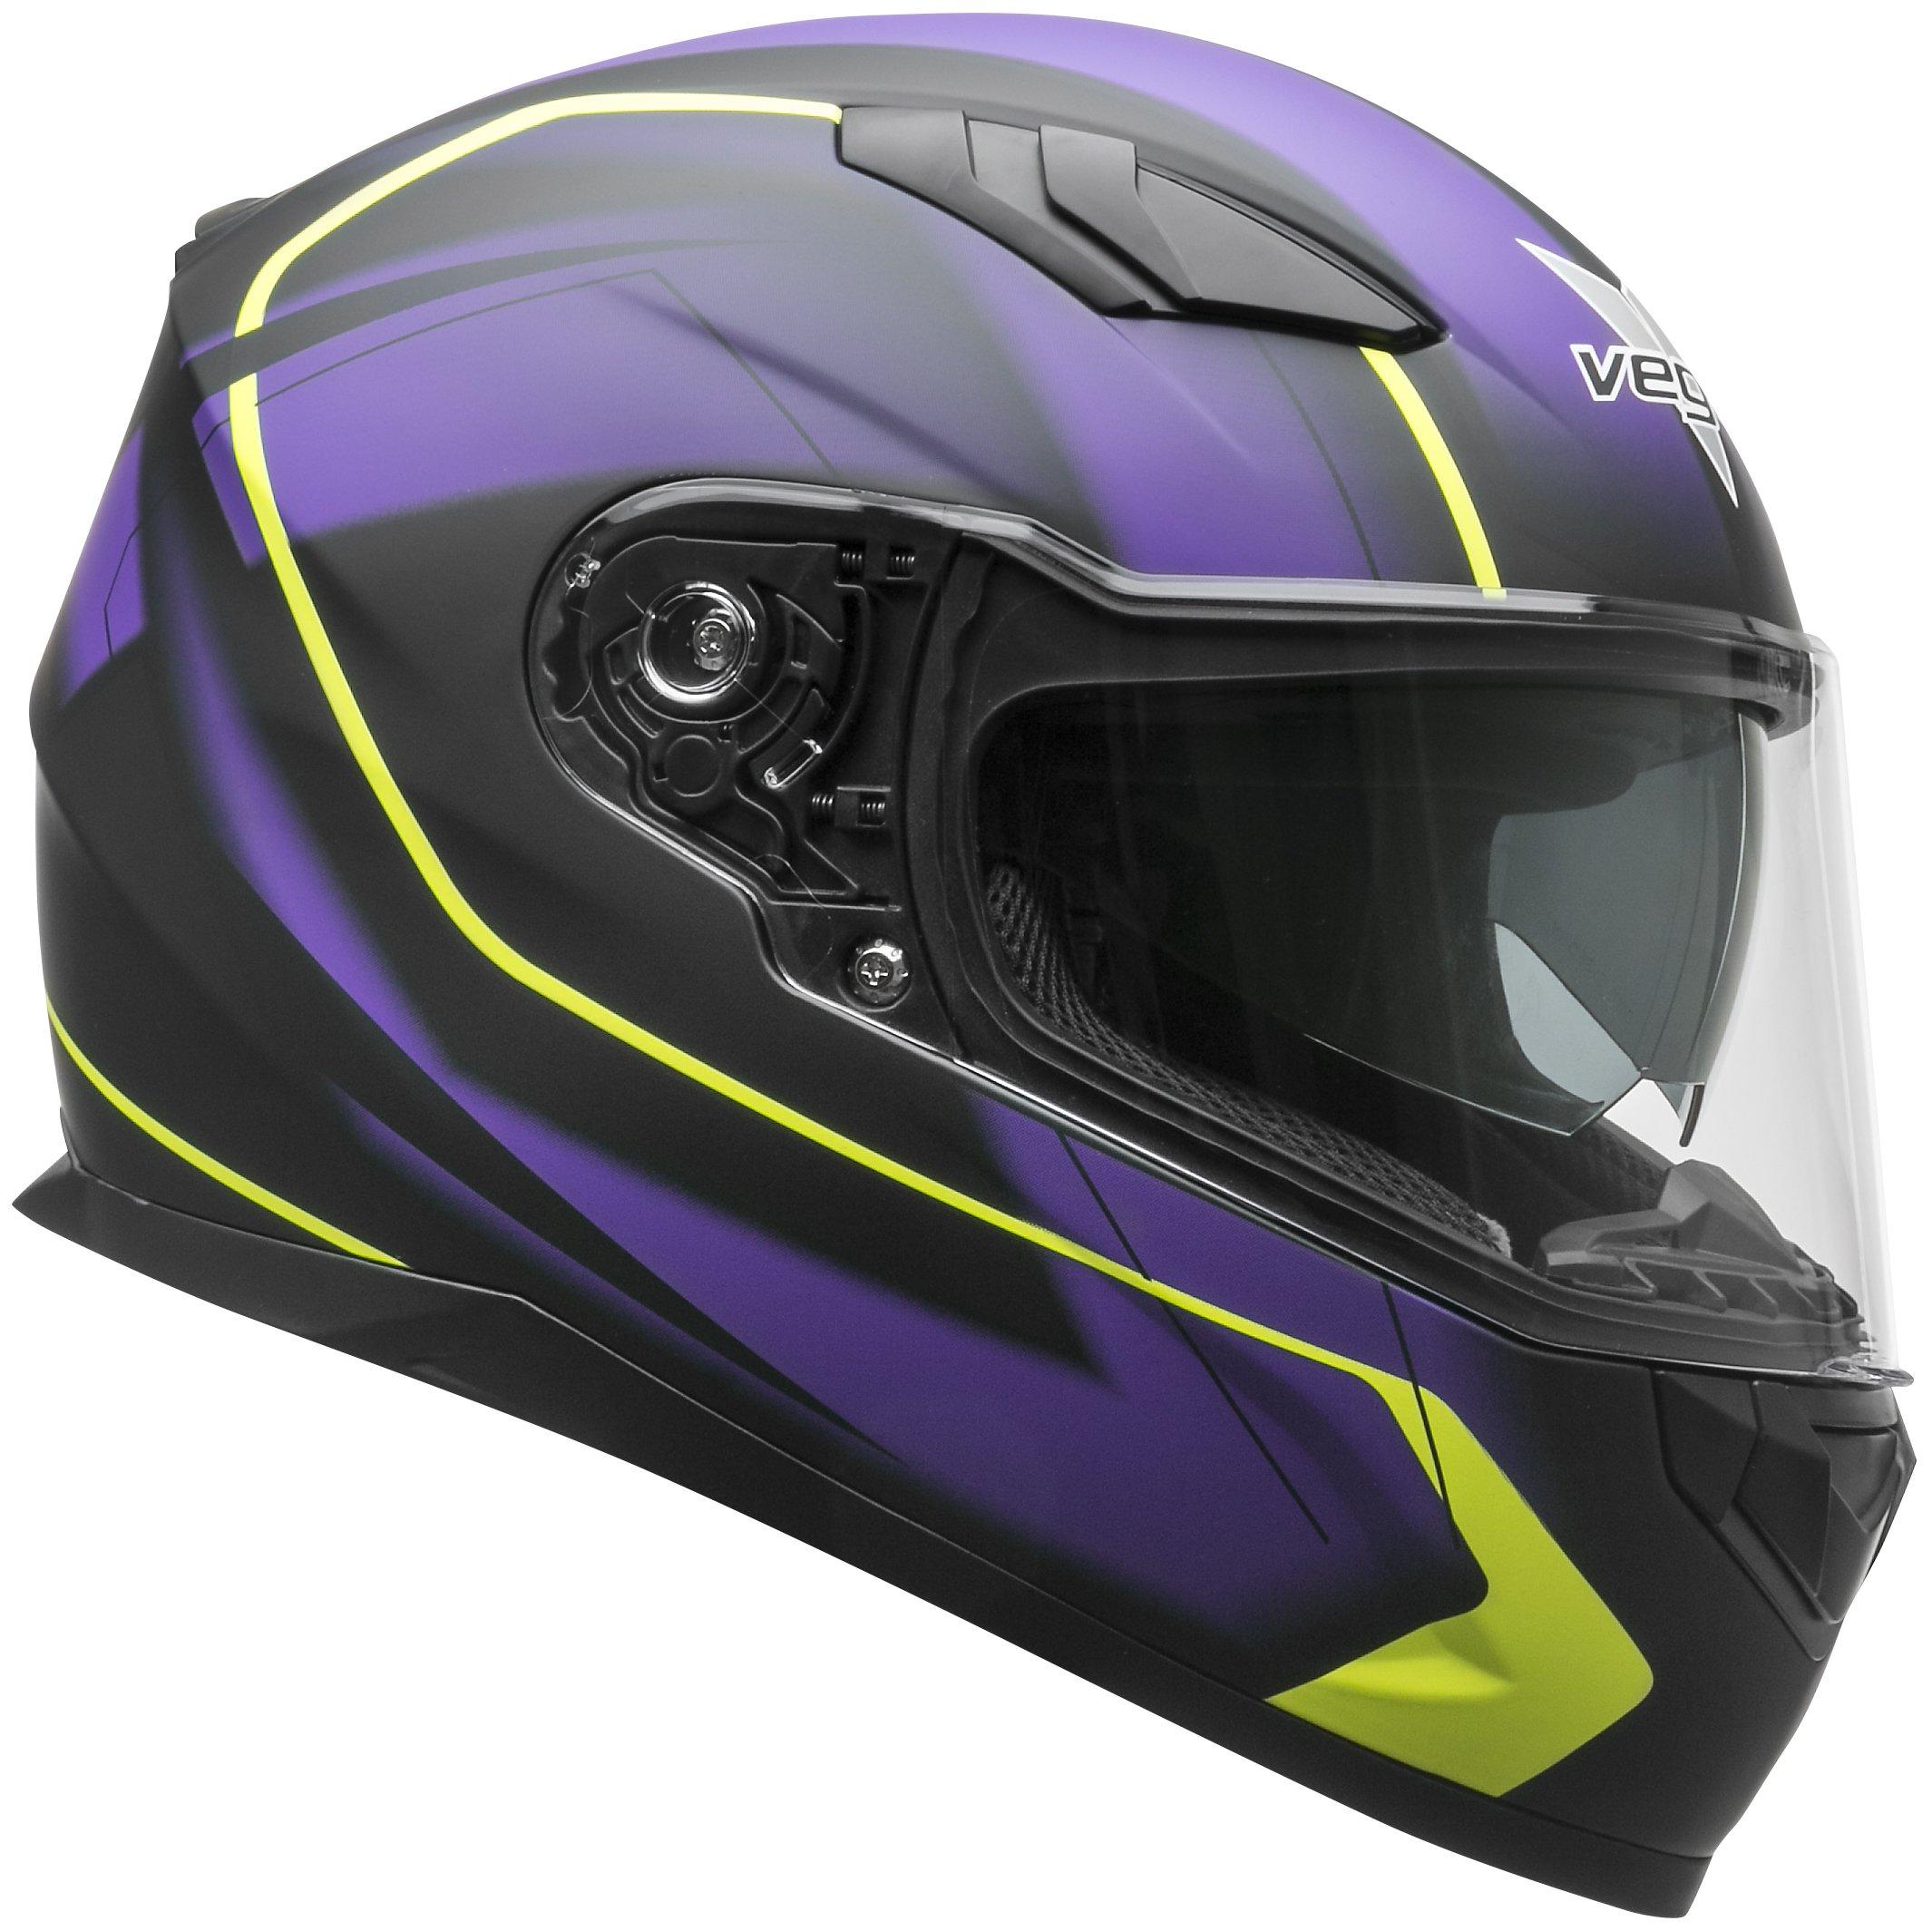 Vega Helmets 60030-462 RS1 Street Sunshield Motorcycle Helmet DOT Certified Full Facerbike Helmet for Cruisers Sports Street Bike Scooter Touring Moped, Bluetooth Comp (Purple Slinger Graphic, Small) by Vega Helmets